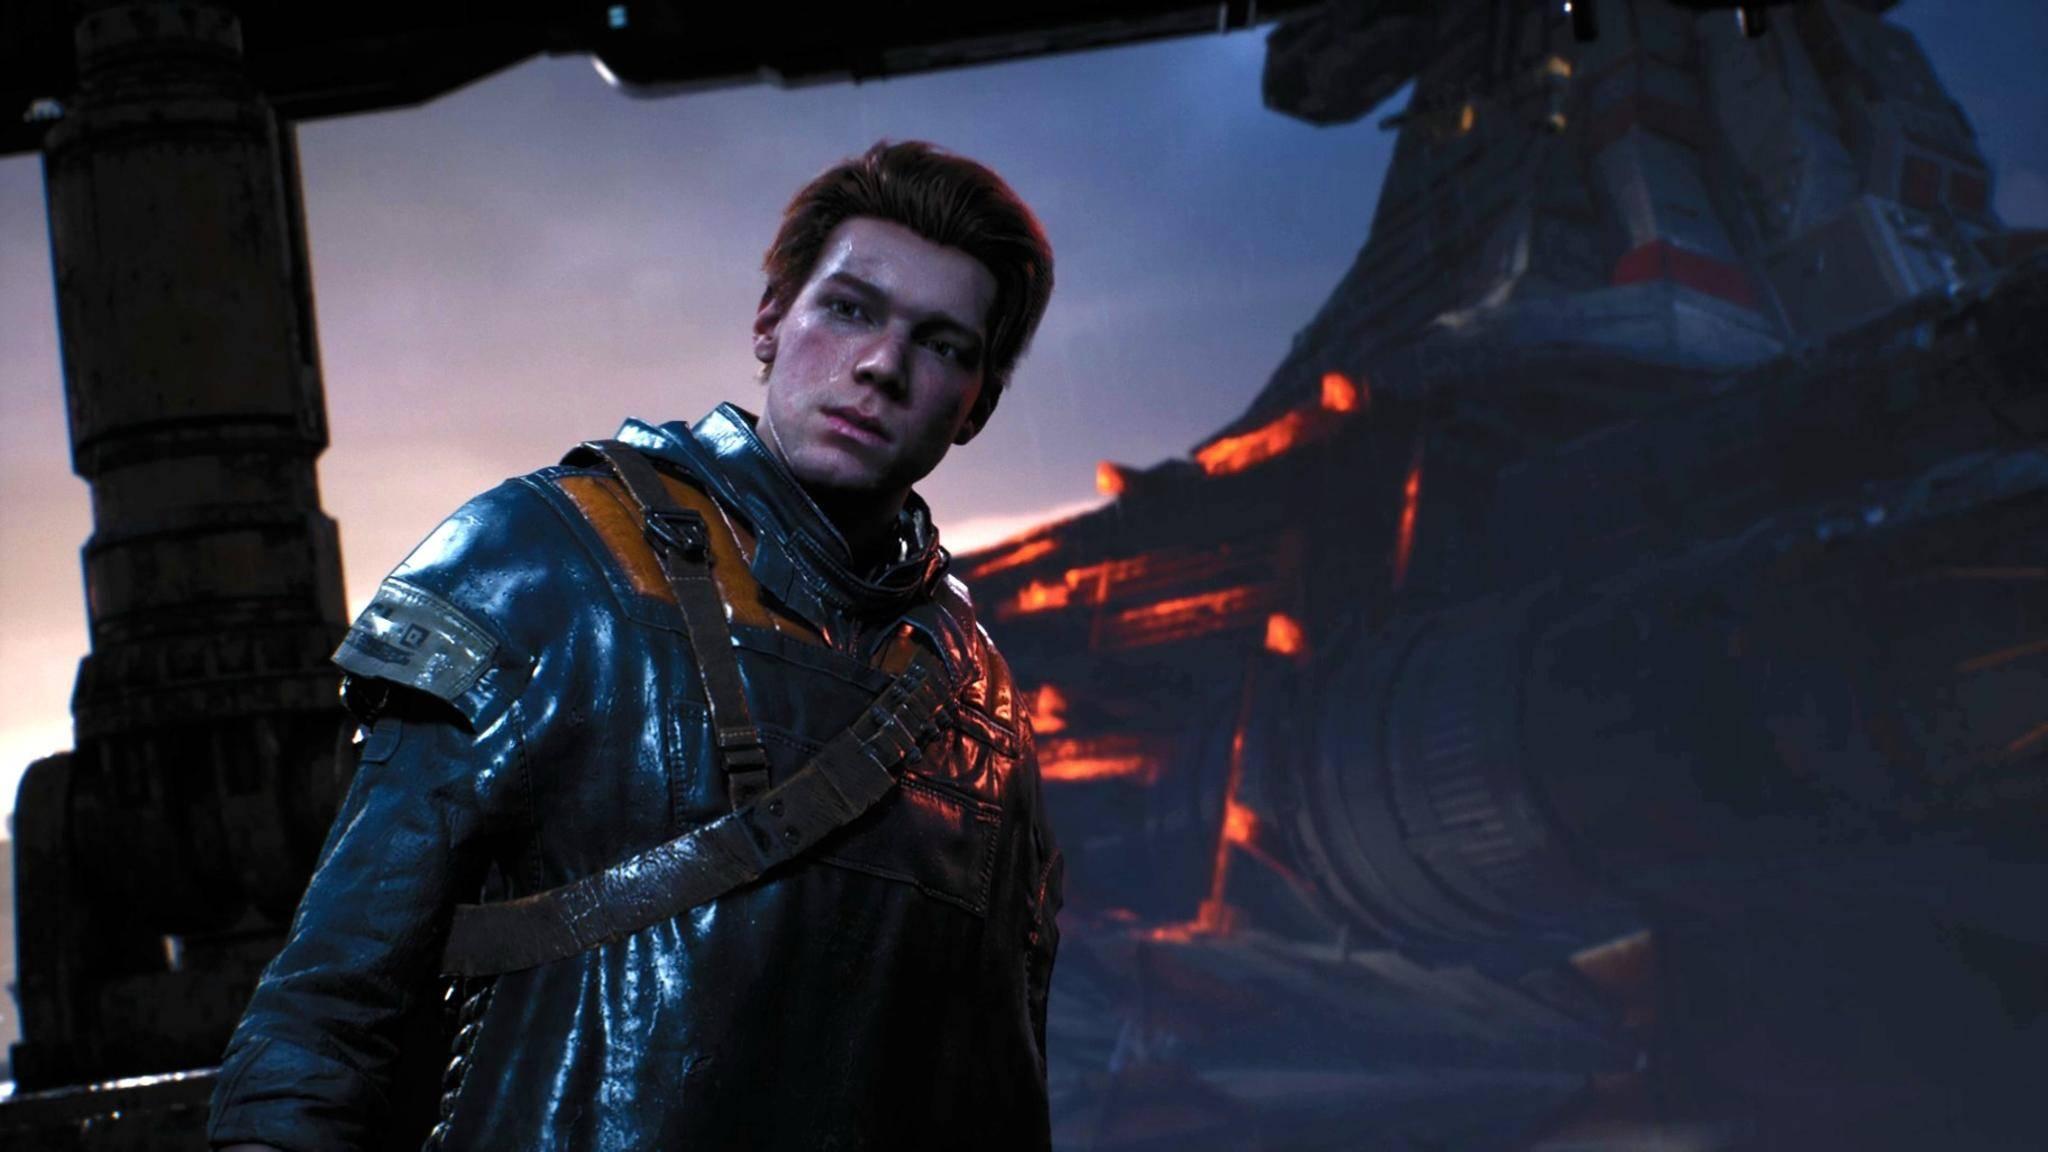 star-wars-jedi-fallen-order-cal-screenshot